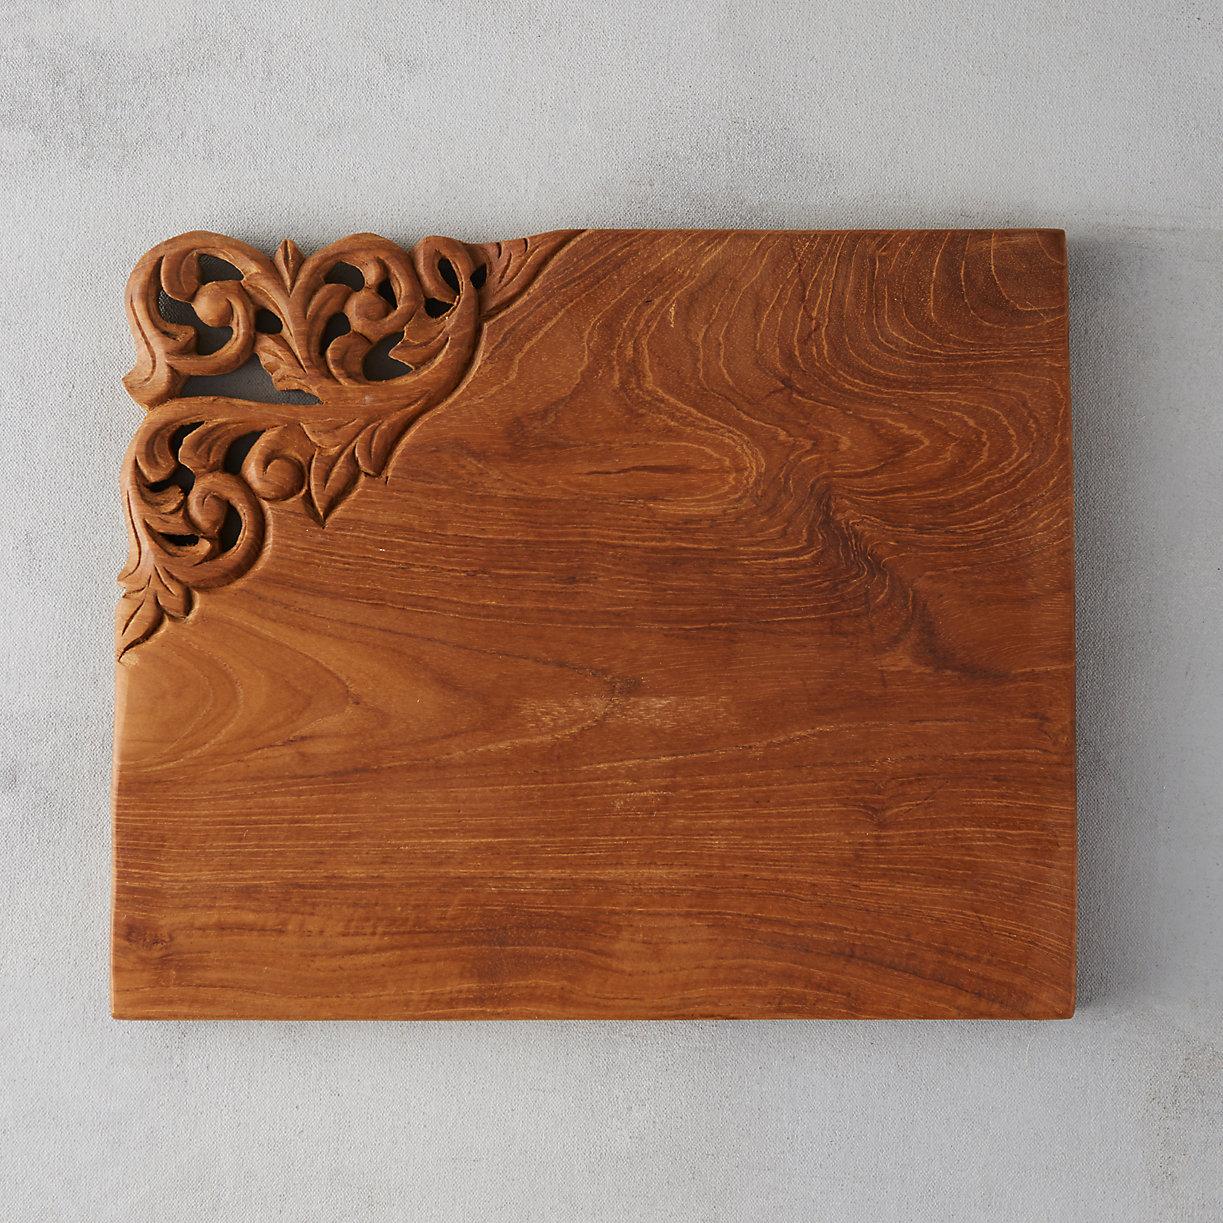 Carved Teak Serving Board Terrain